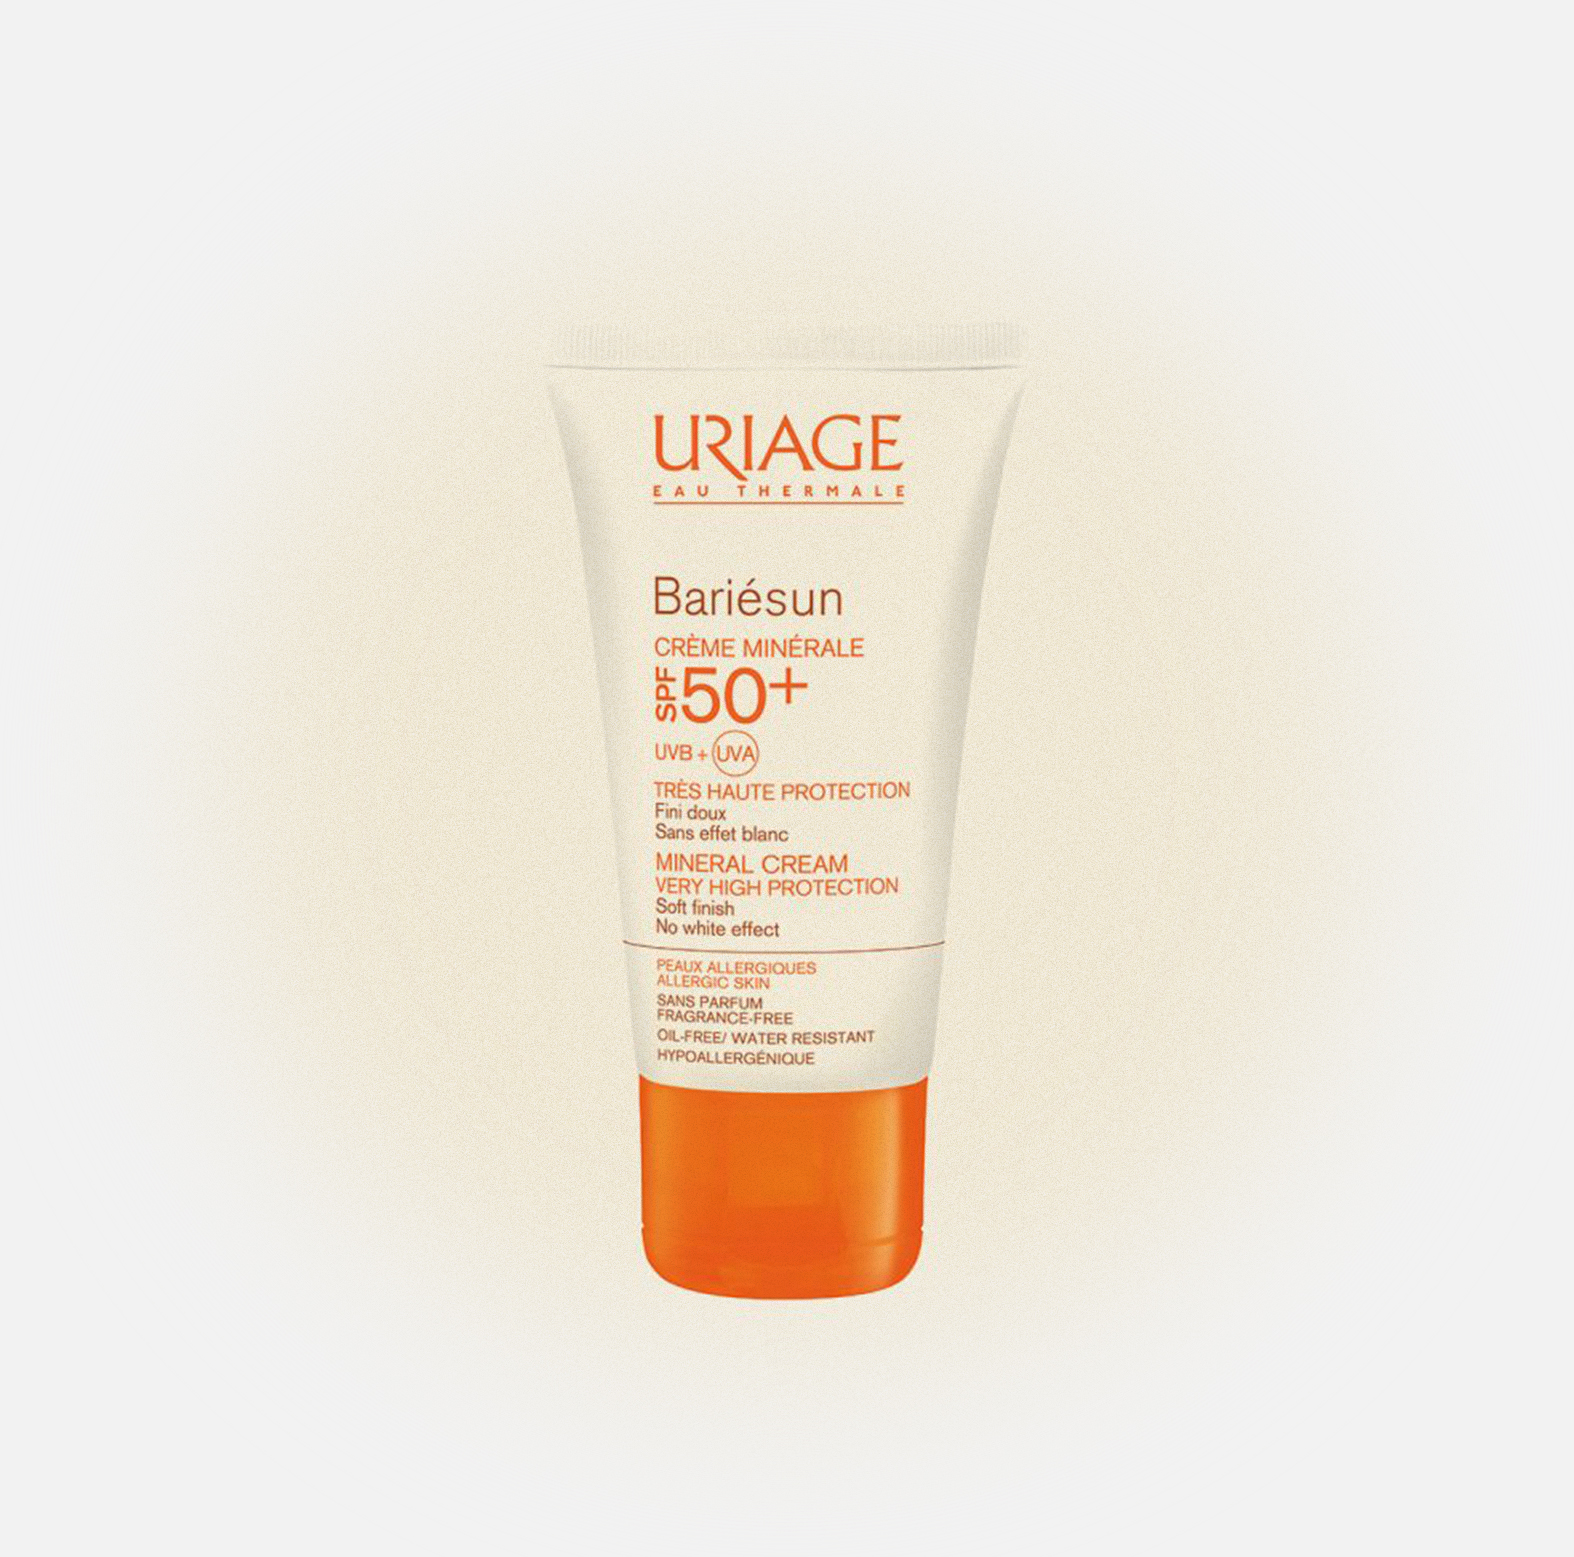 Барьесан SPF 50+ минеральный крем Bariesun SPF 50+ Mineral Cream, Uriage